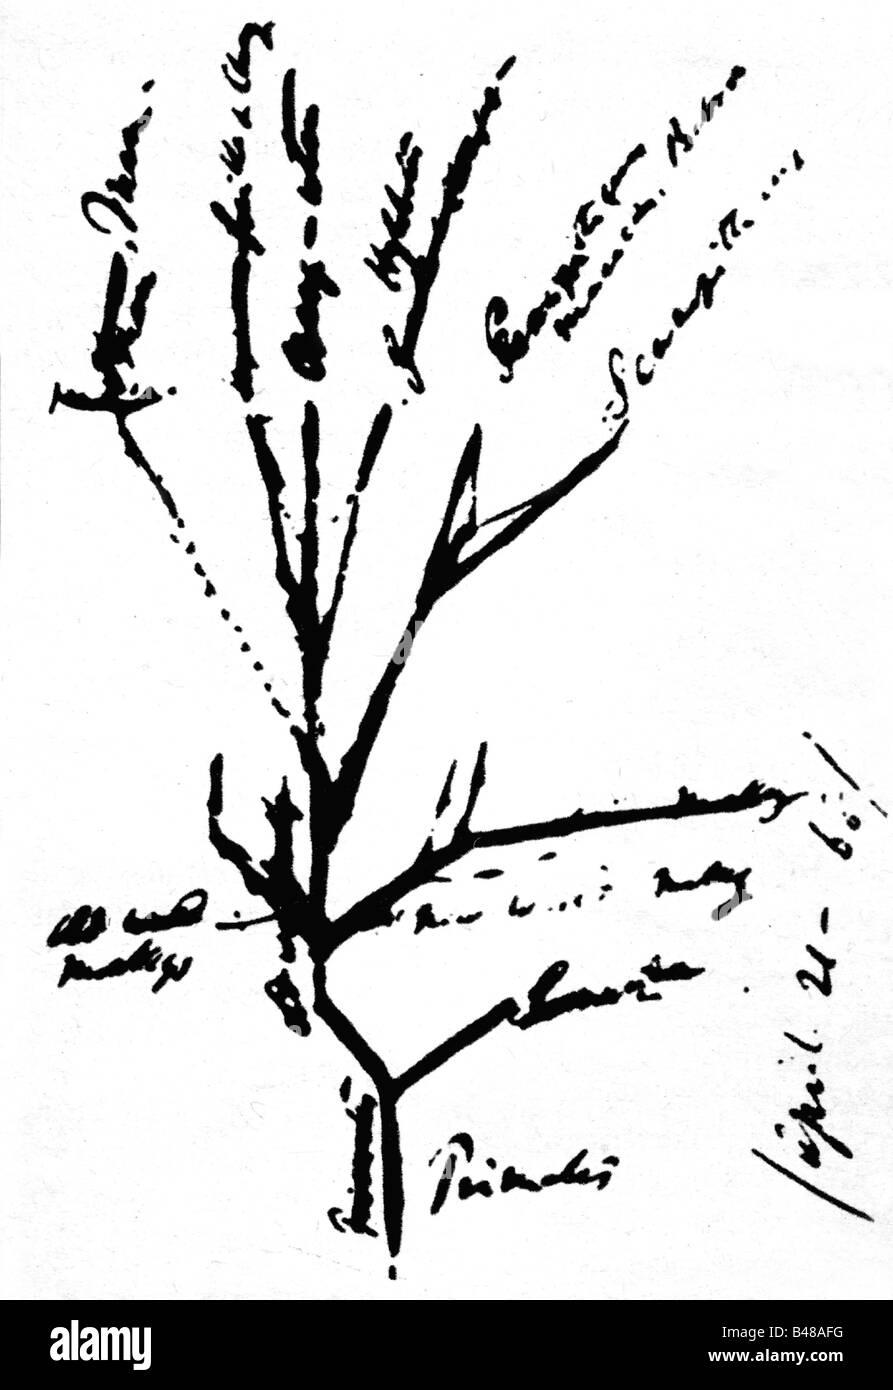 Darwin, Charles Robert, 12.2.1809 - 19.4.1882, British naturalist, graphical draft of the primate`s genealogical - Stock Image